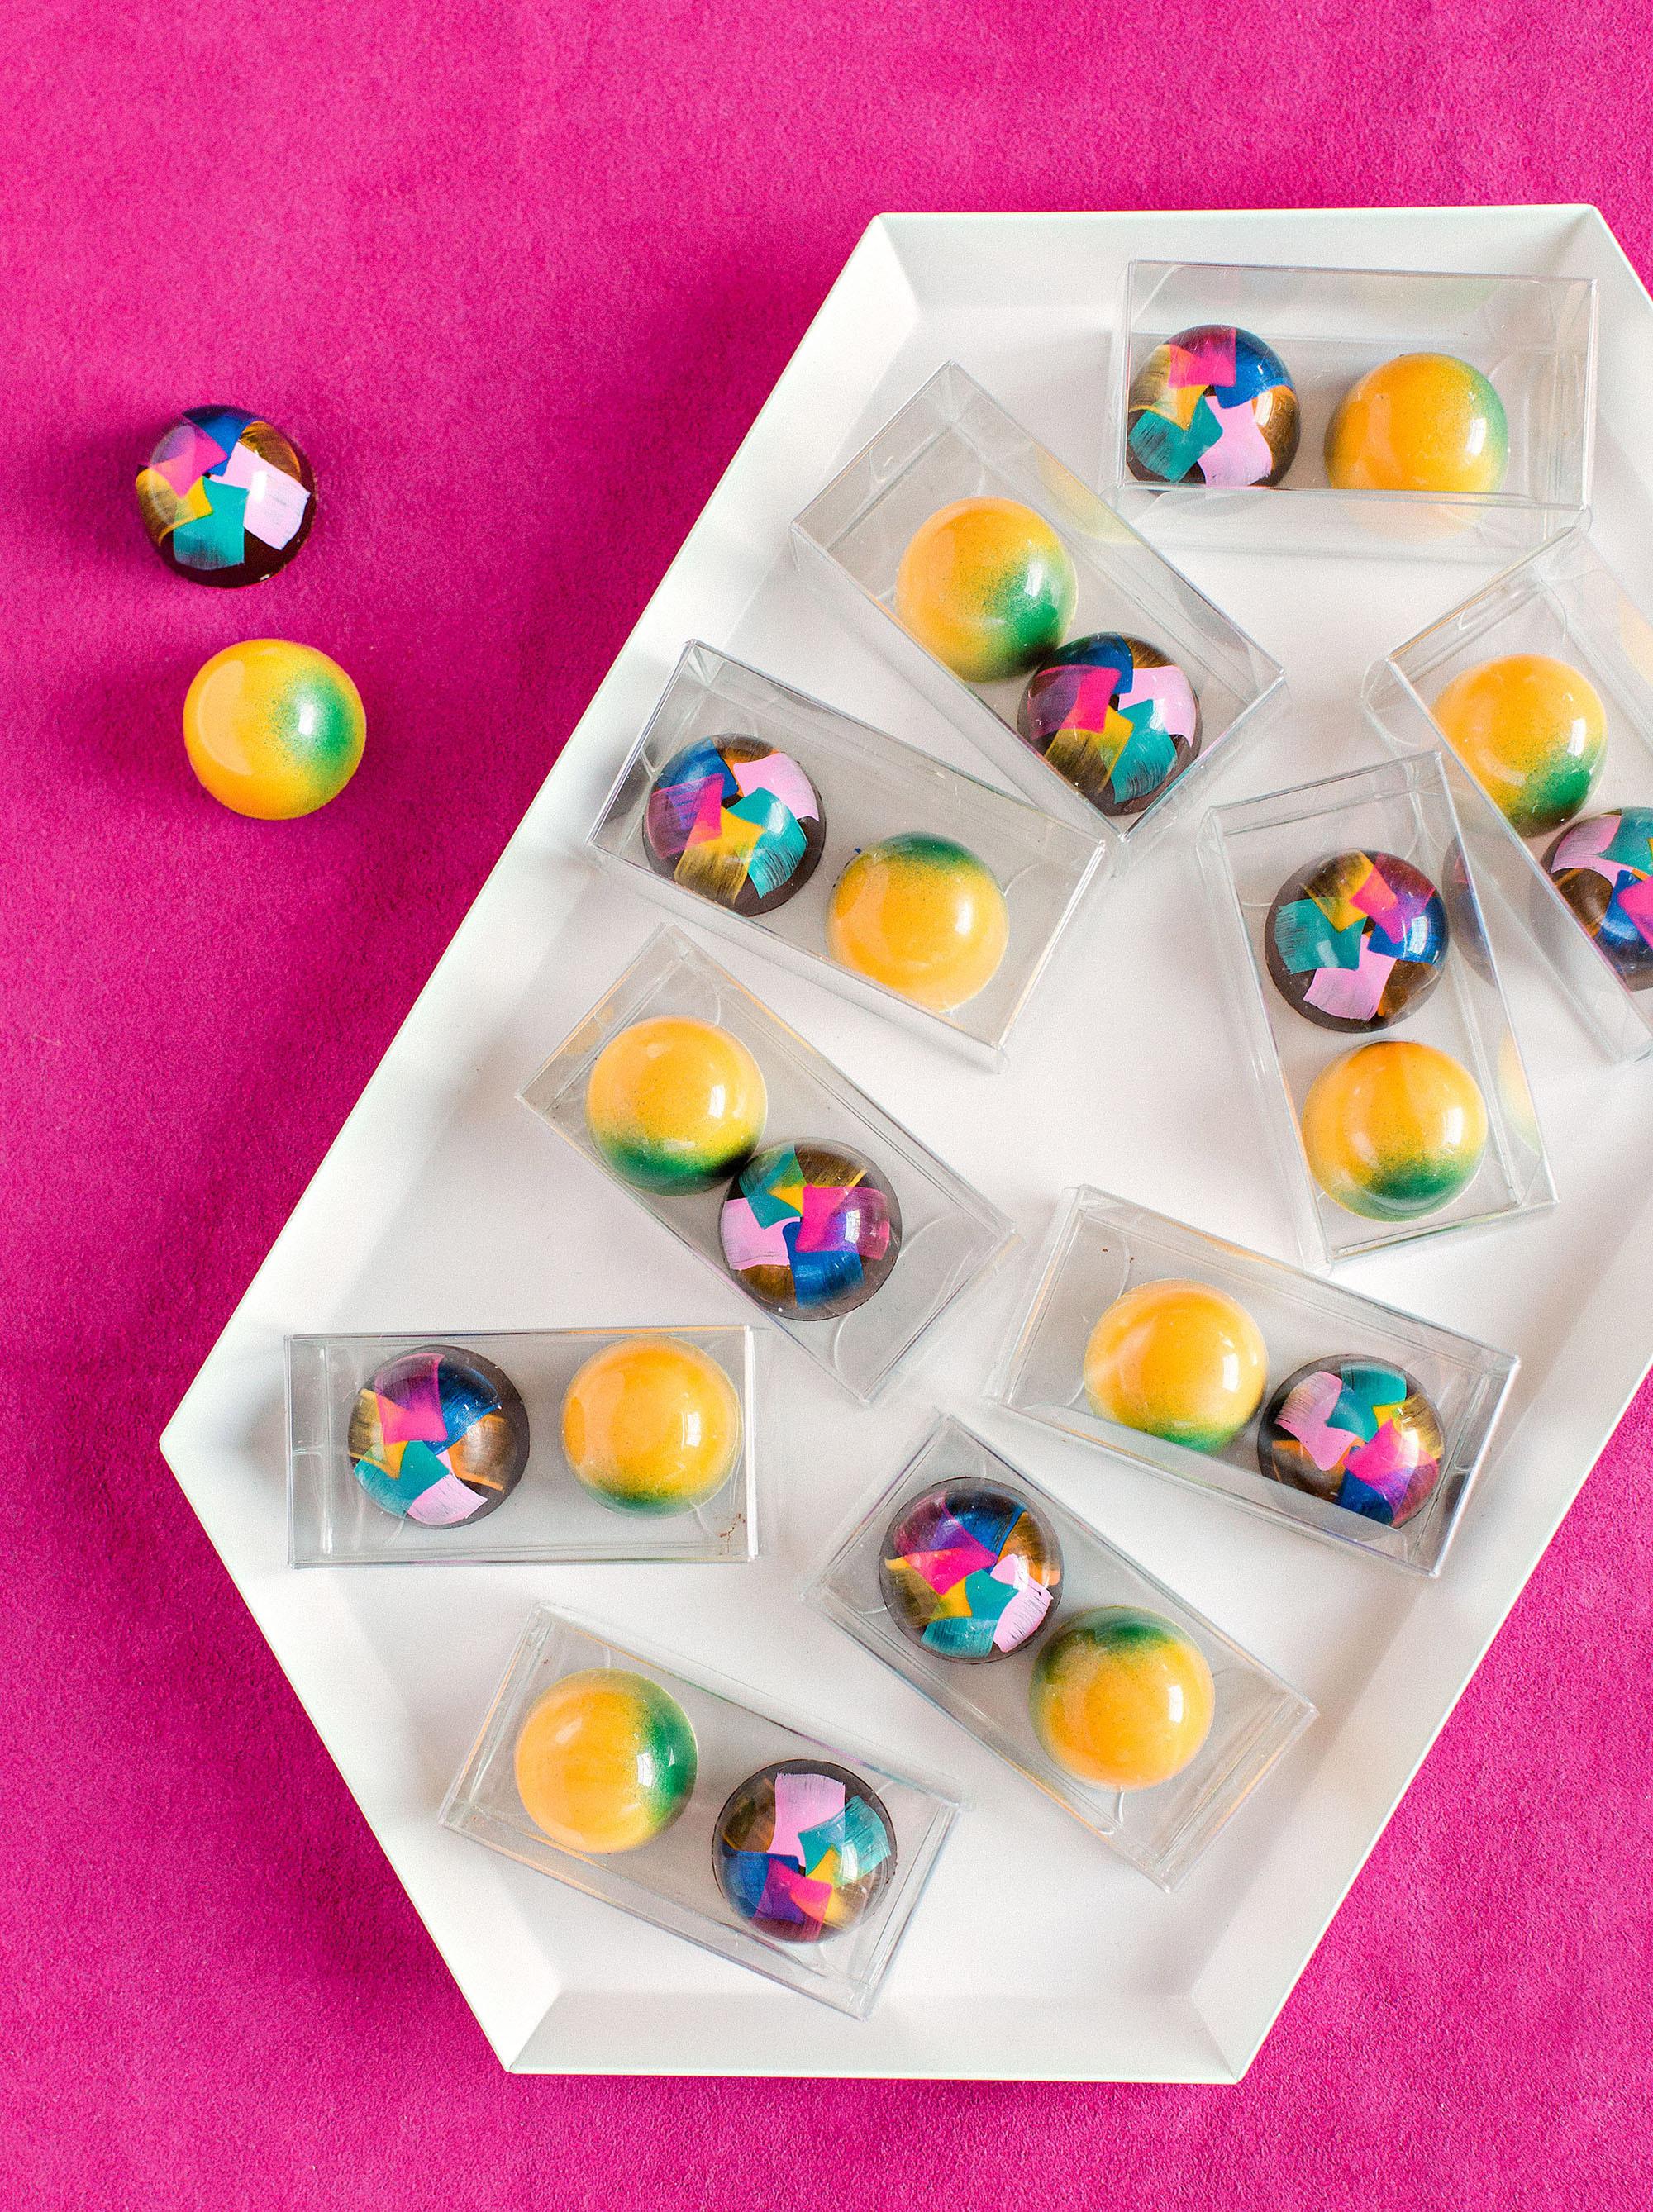 risa ross wedding brooklyn new york bonbons